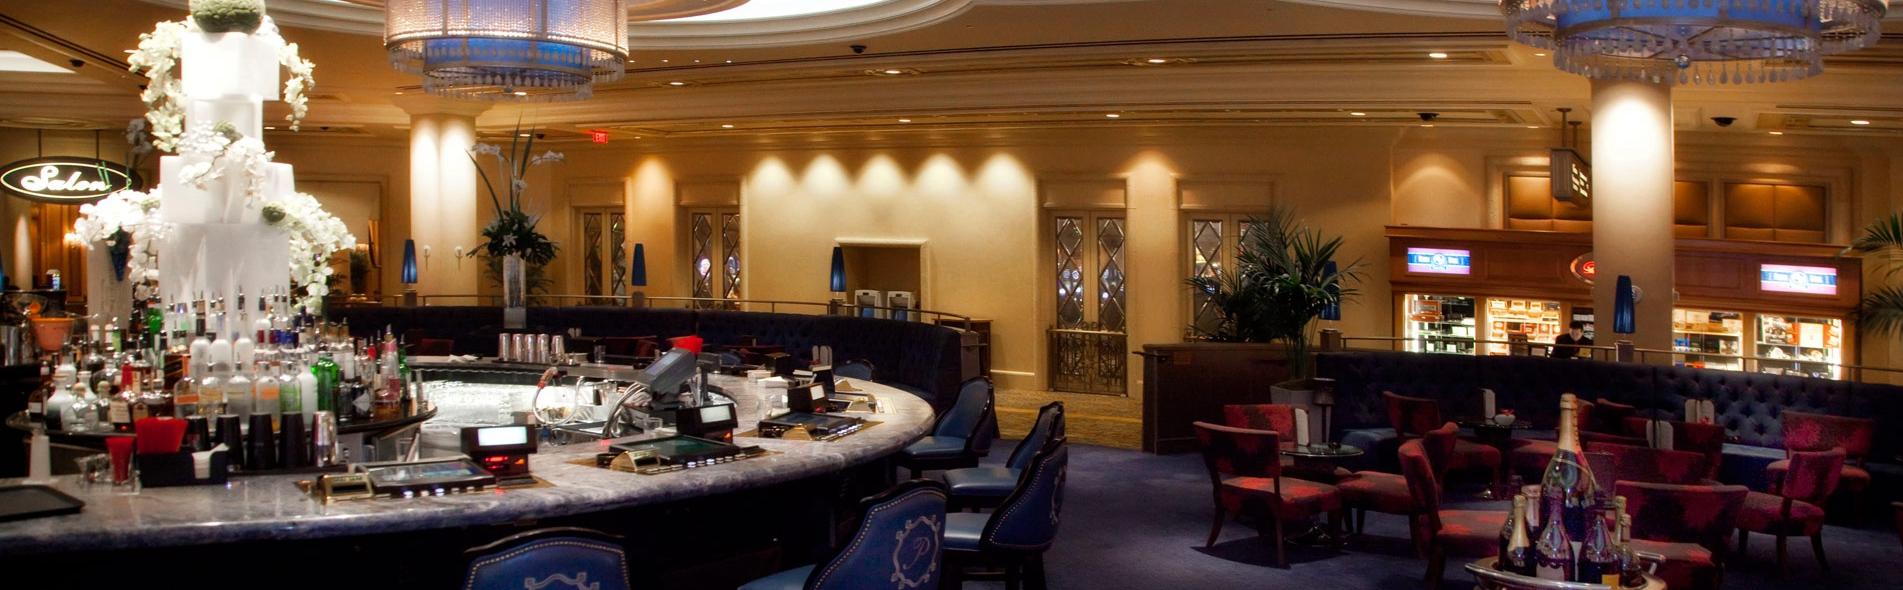 Laguna Champagne Bar @ Palazzo Hotel & Casino Las Vegas